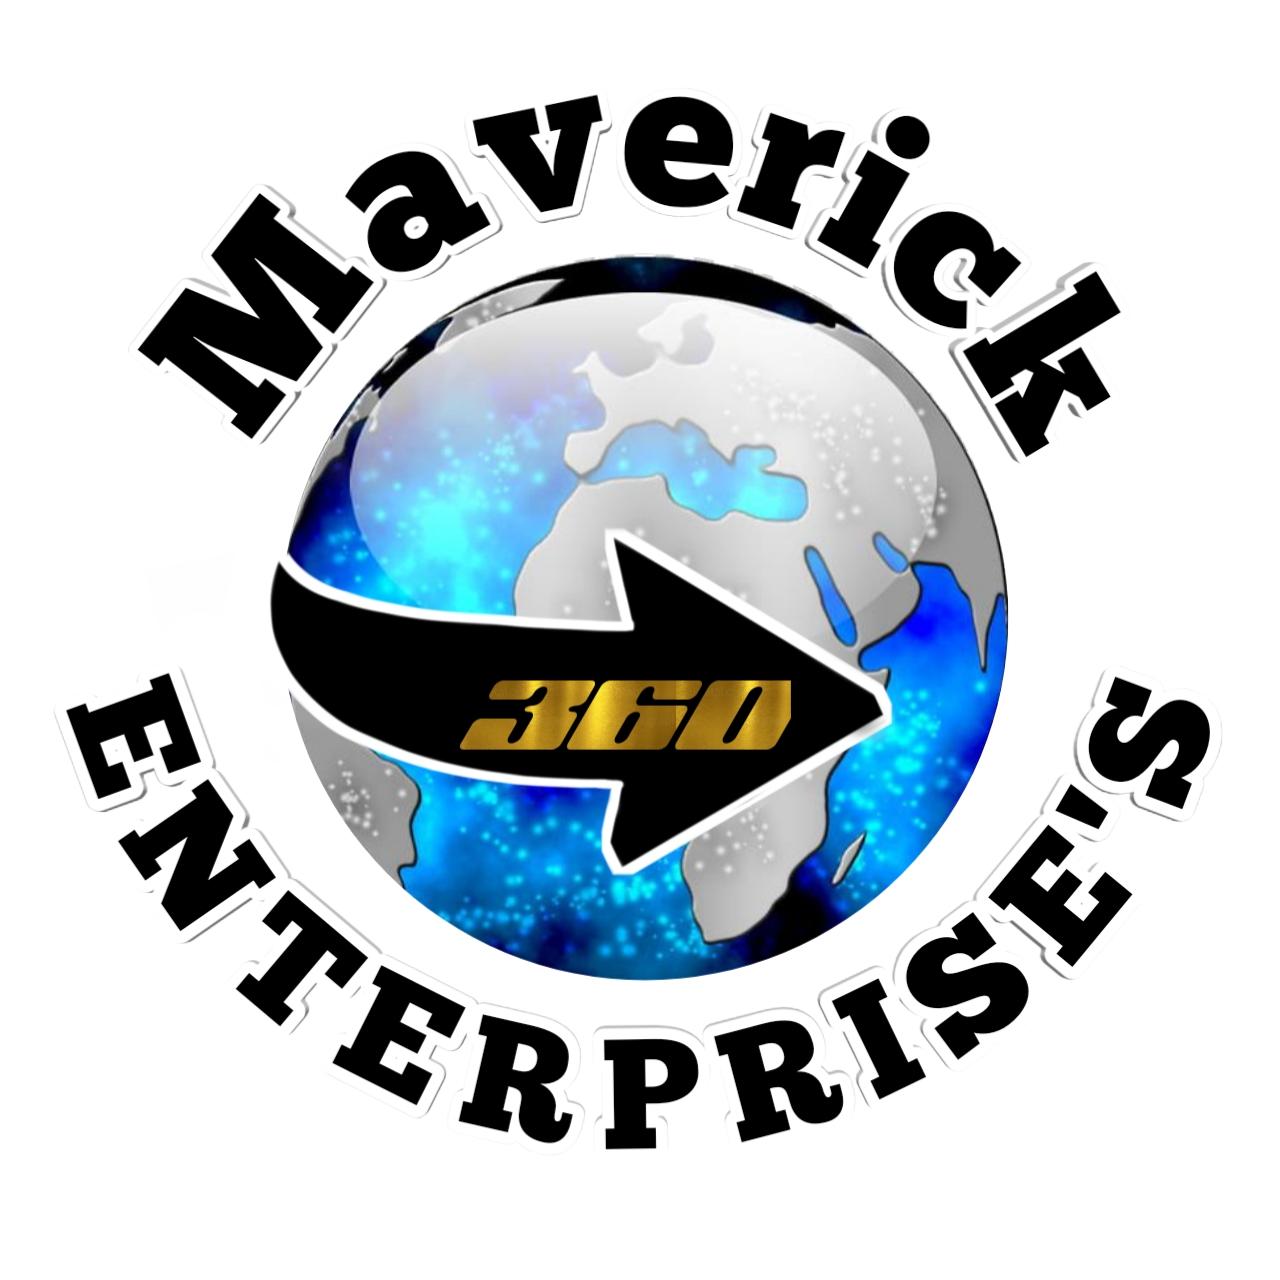 maverick360enterprises